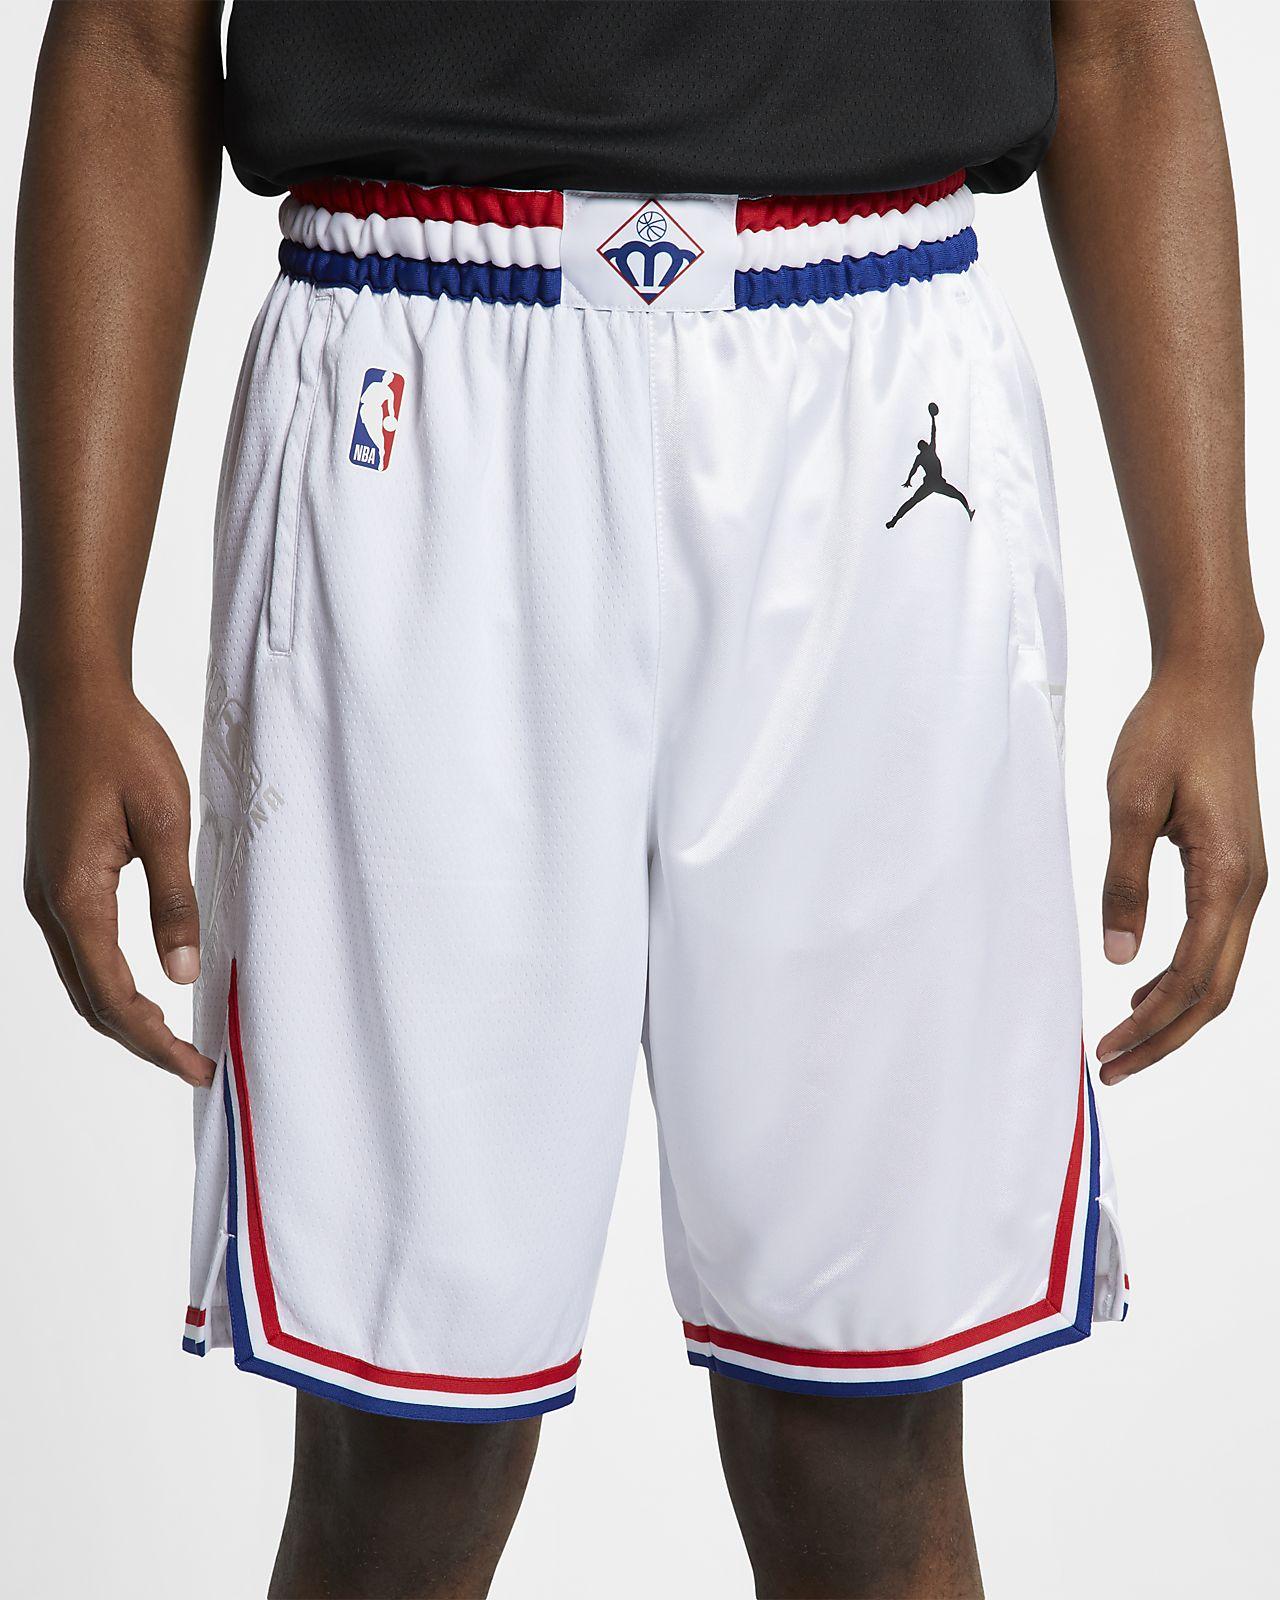 b0a381a5495f All-Star Edition Swingman Men s Jordan NBA Shorts. Nike.com NZ